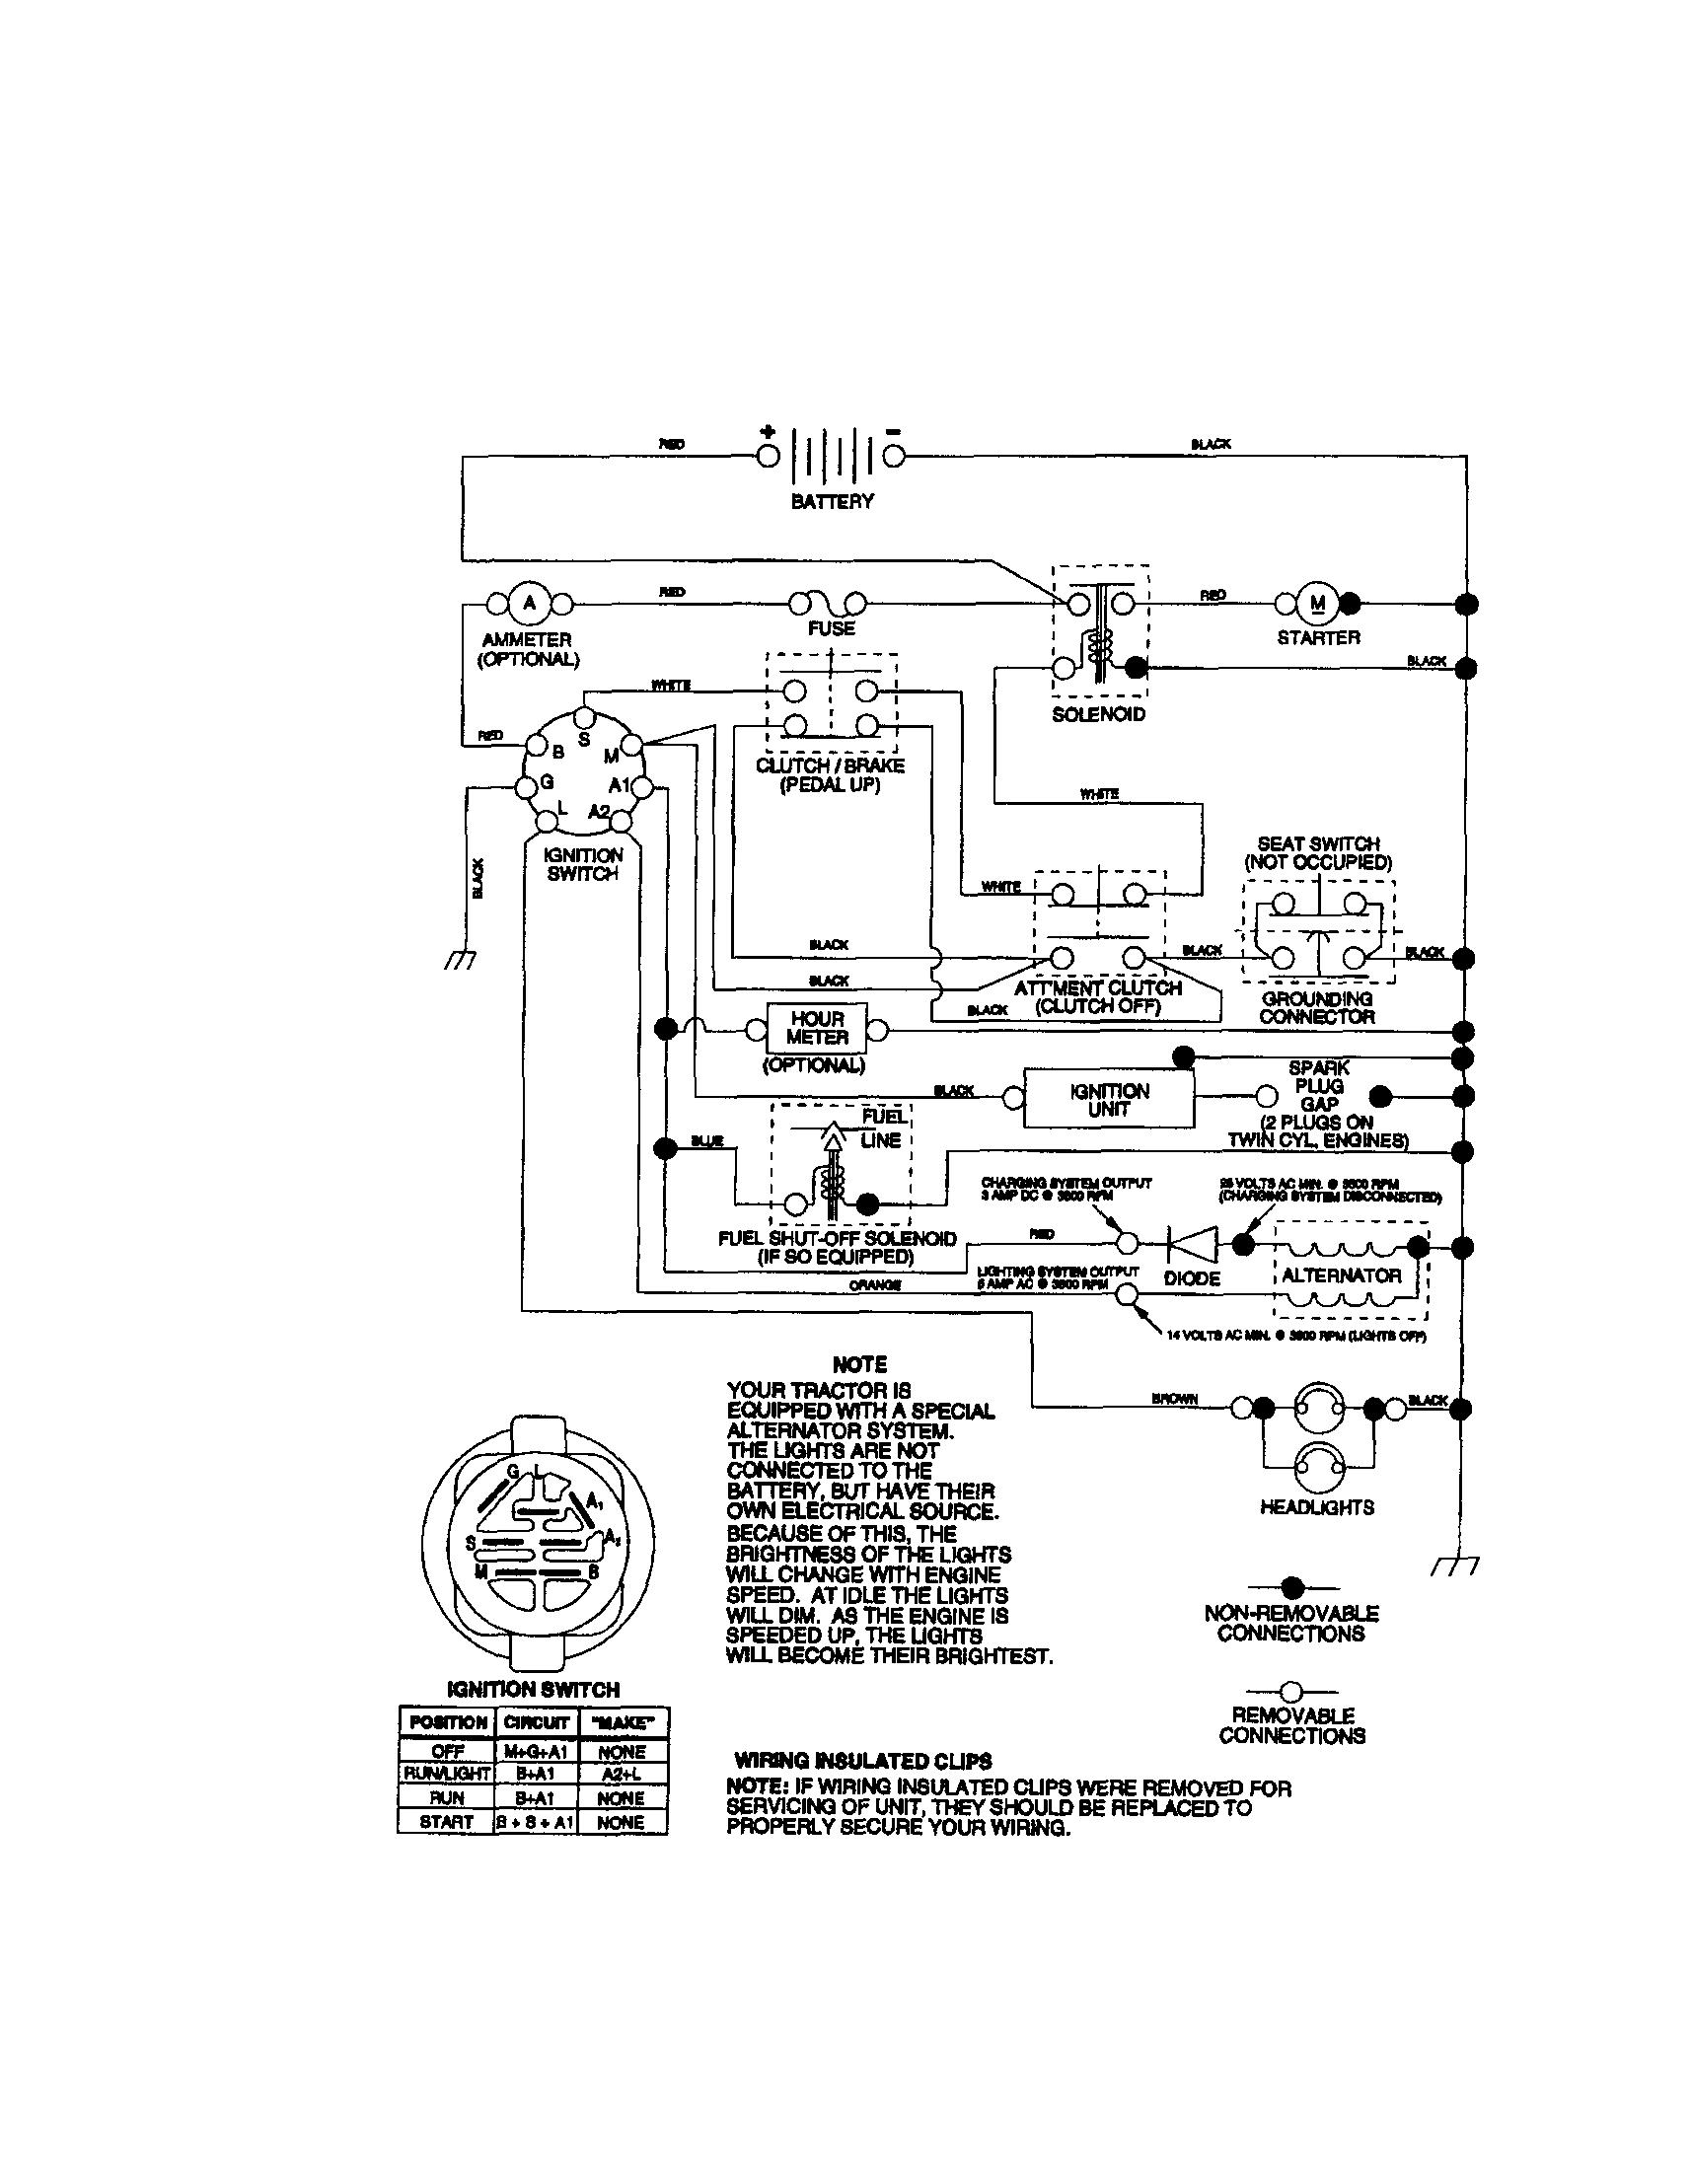 Craftsman Mower Wiring Diagram from wiringall.com